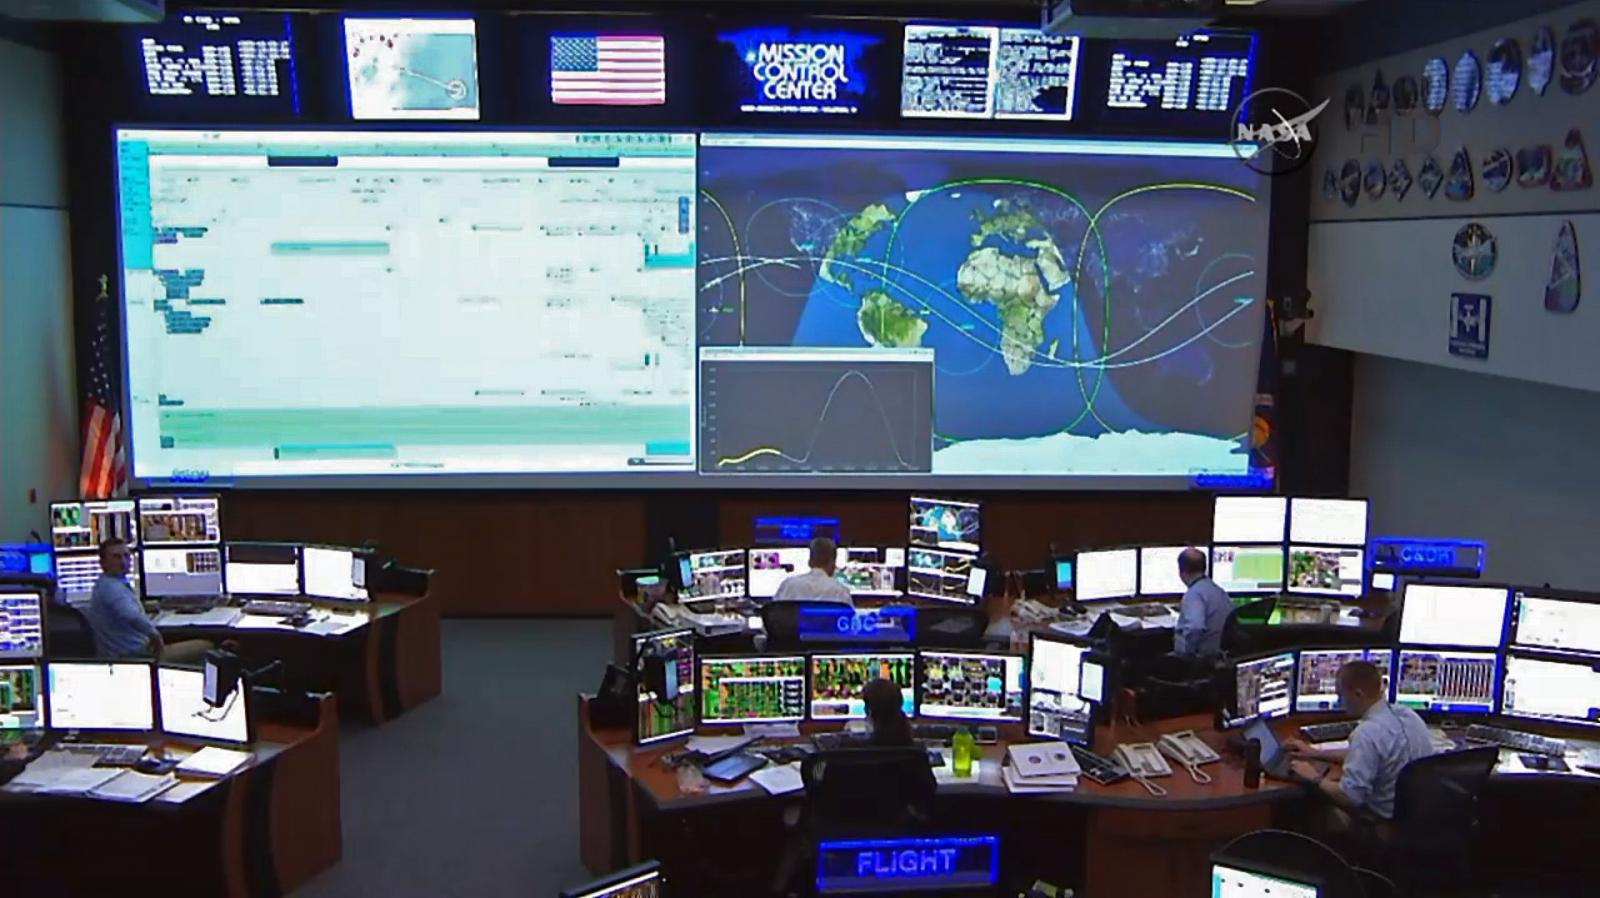 houston mission control center - photo #22